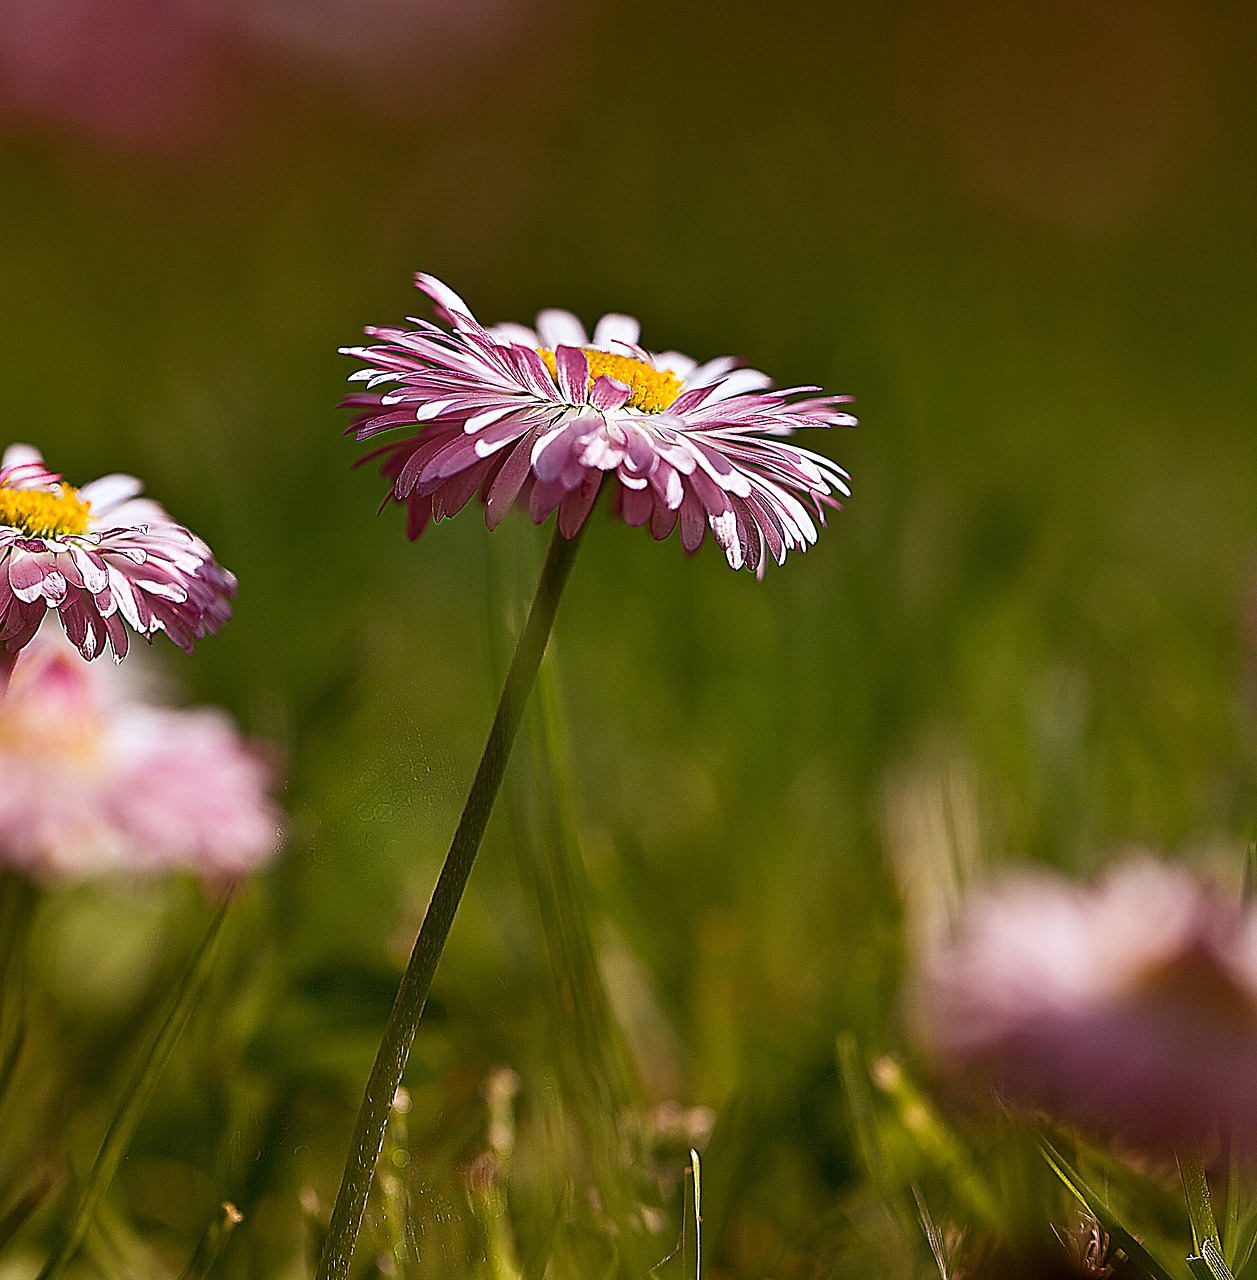 Daisiesflowersflowers Wildflowersgarden Flowersgarden Free